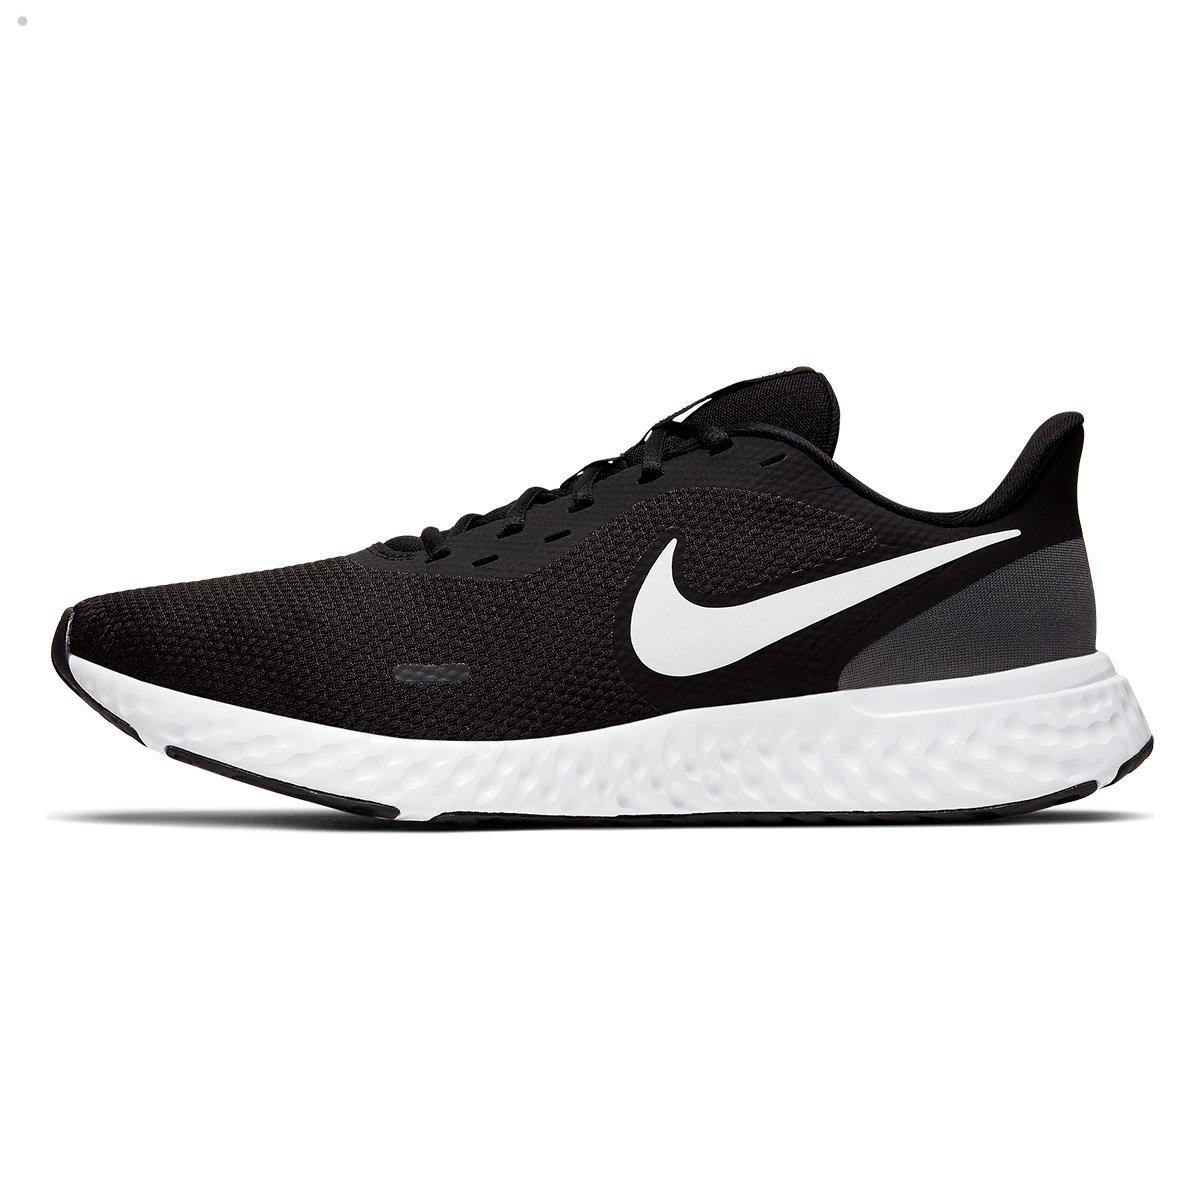 Tênis Nike Revolution 5 Masculino - Tam: 42 - 3